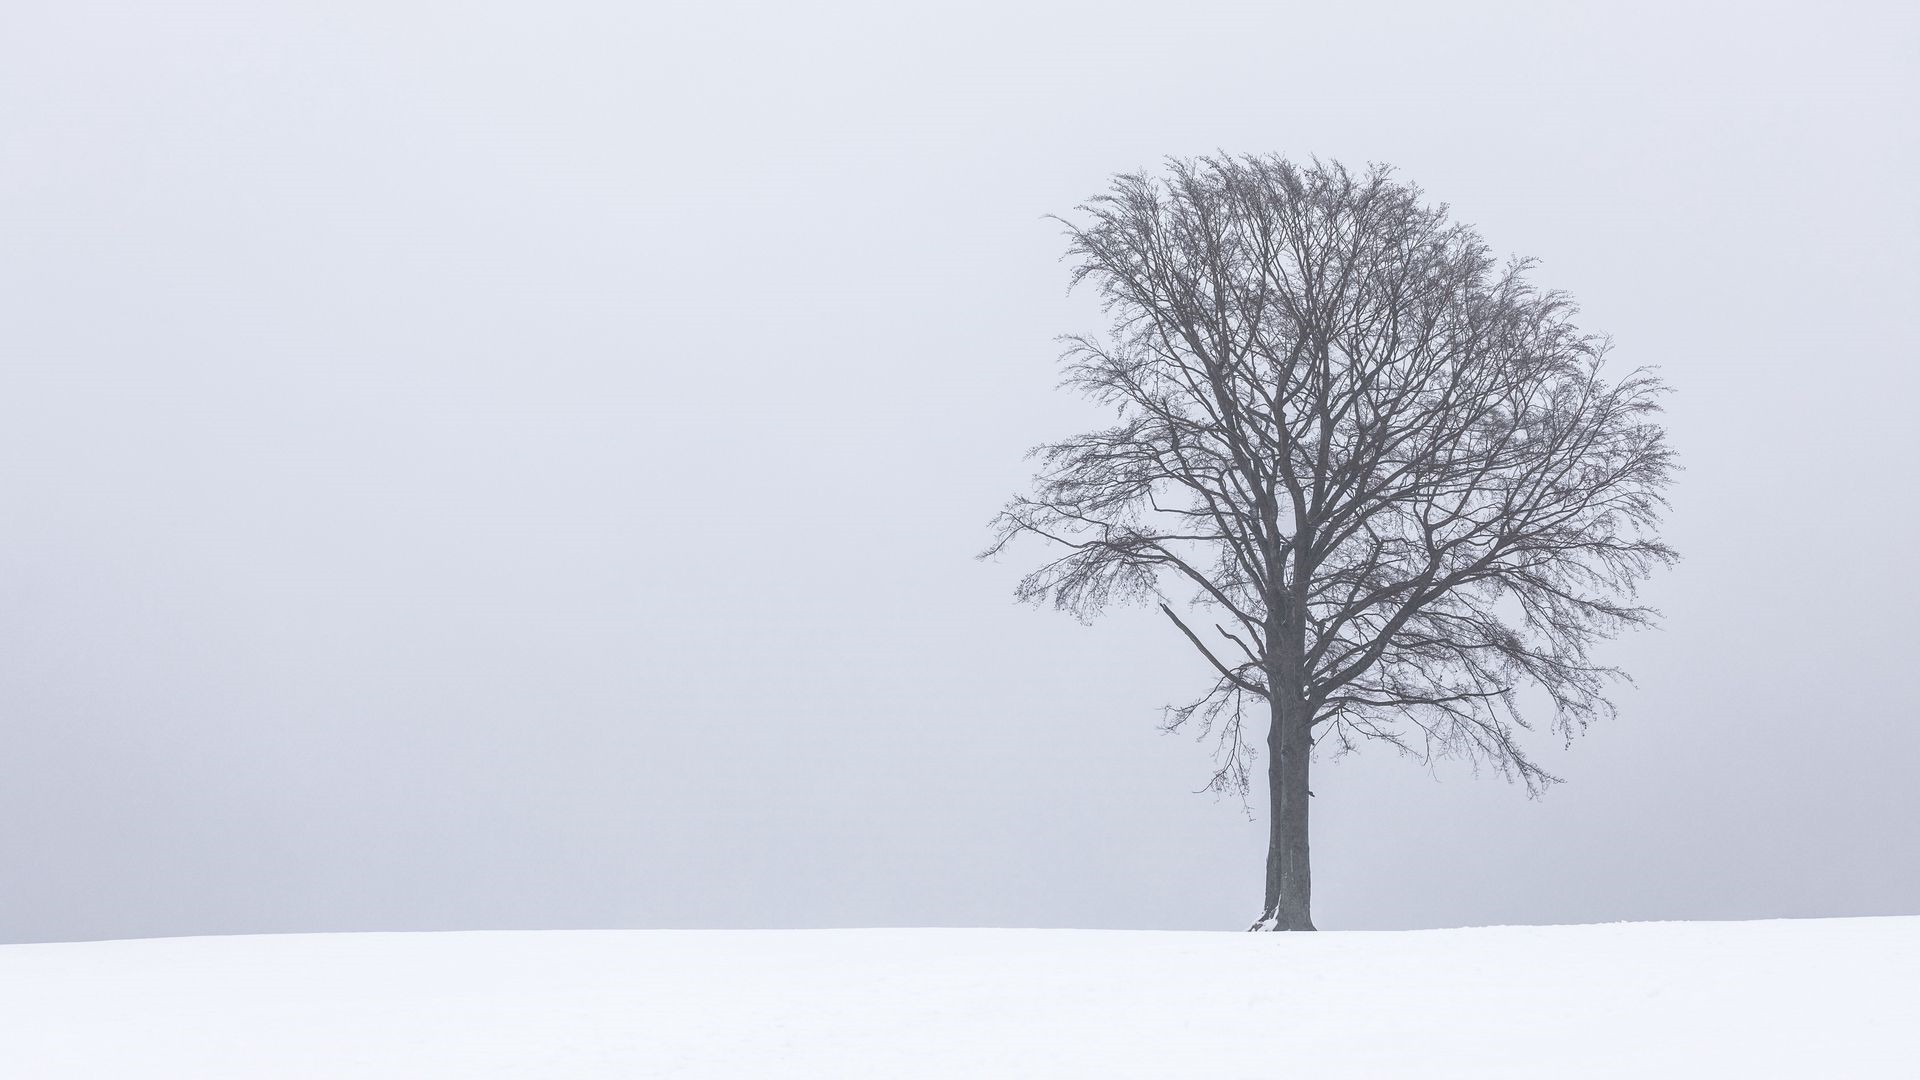 Lonely Trees Minimalist wallpaper for desktop